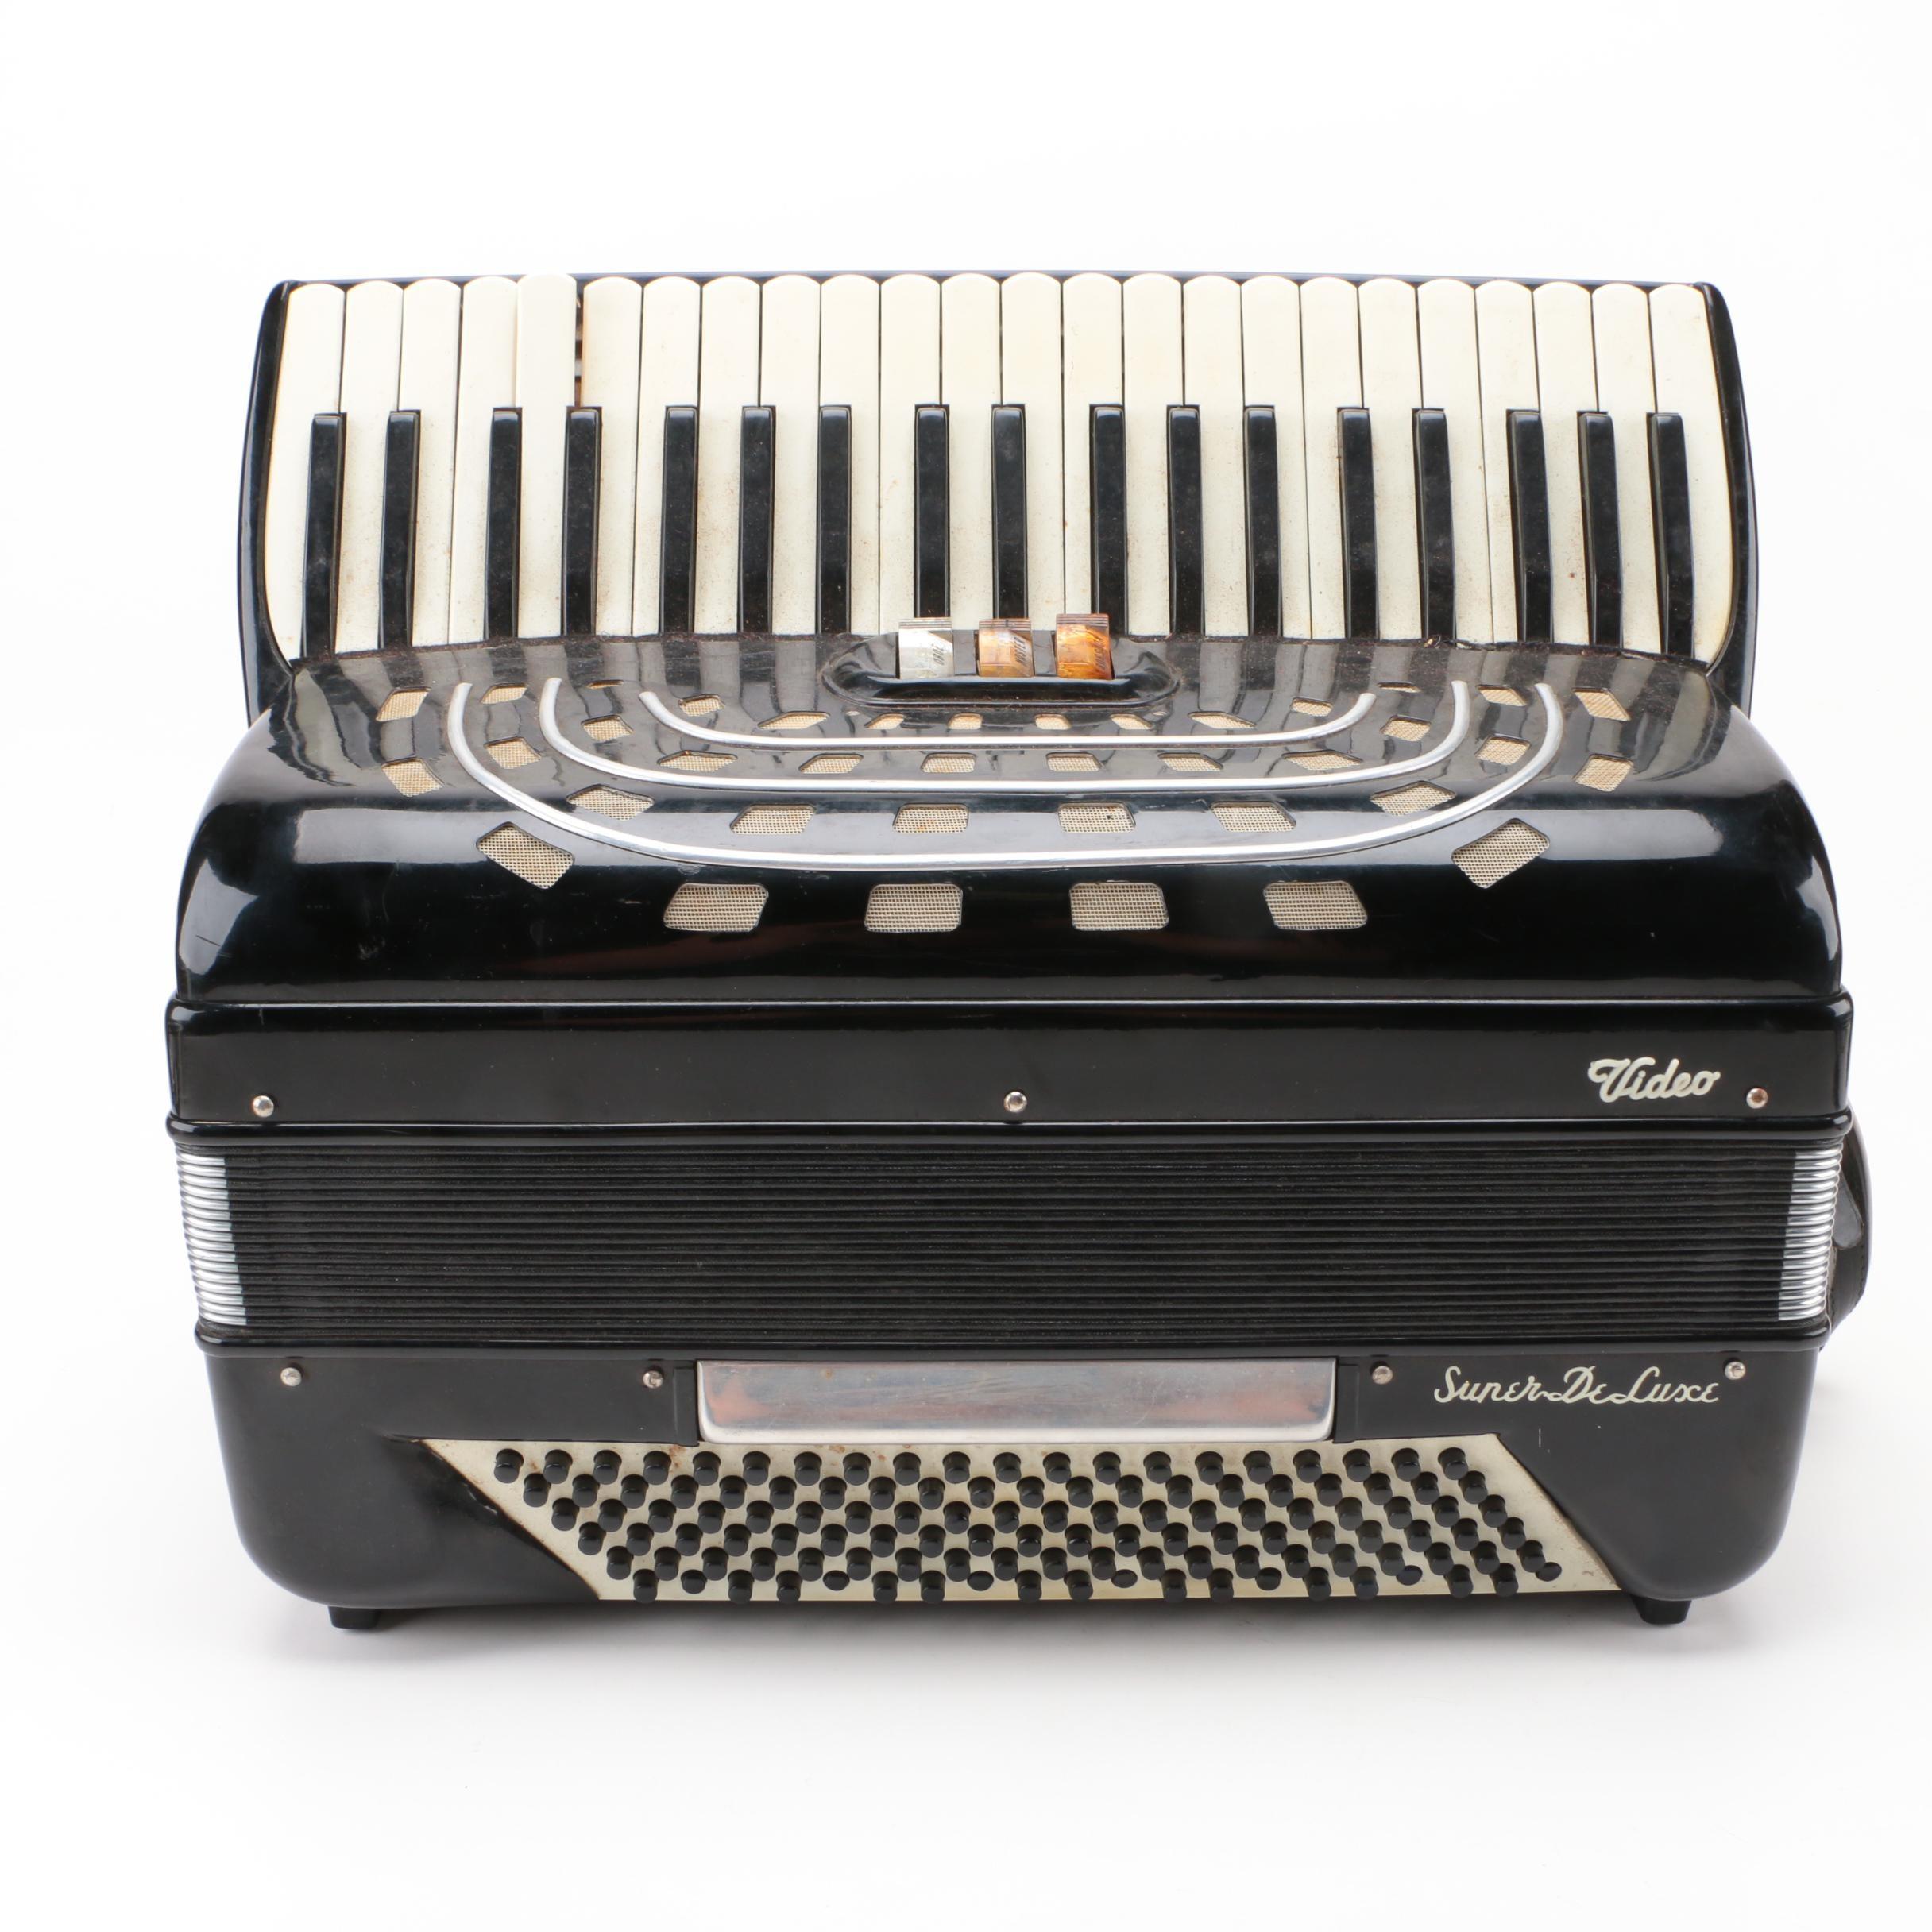 Vintage Italian Video Super DeLuxe Piano Accordion